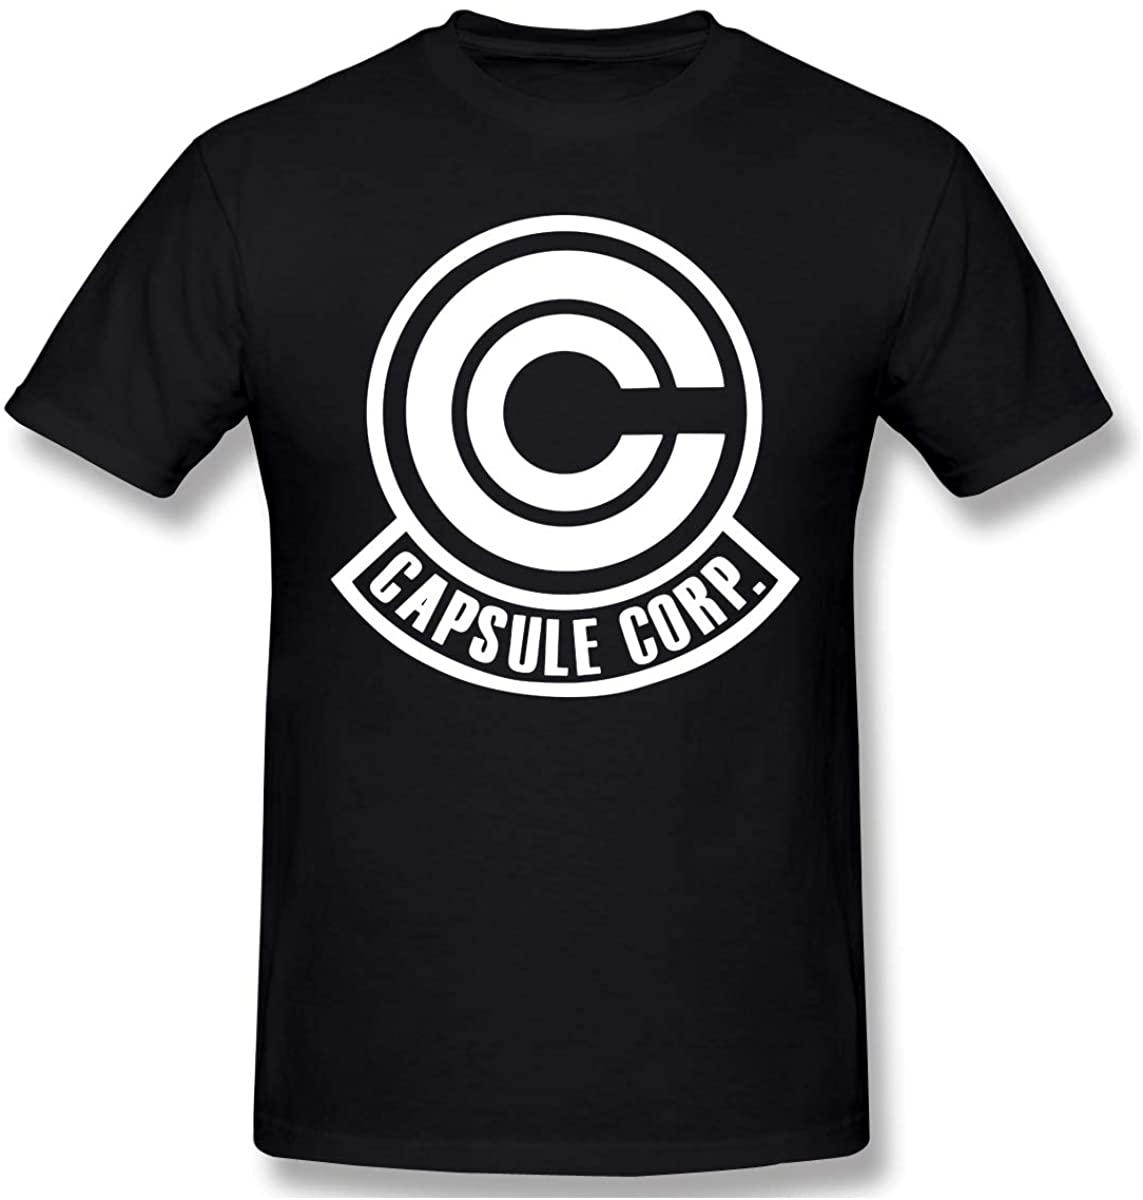 NYF Capsule Corp Mens Short Sleeve T-Shirt Graphic T-Shirts Tee Black